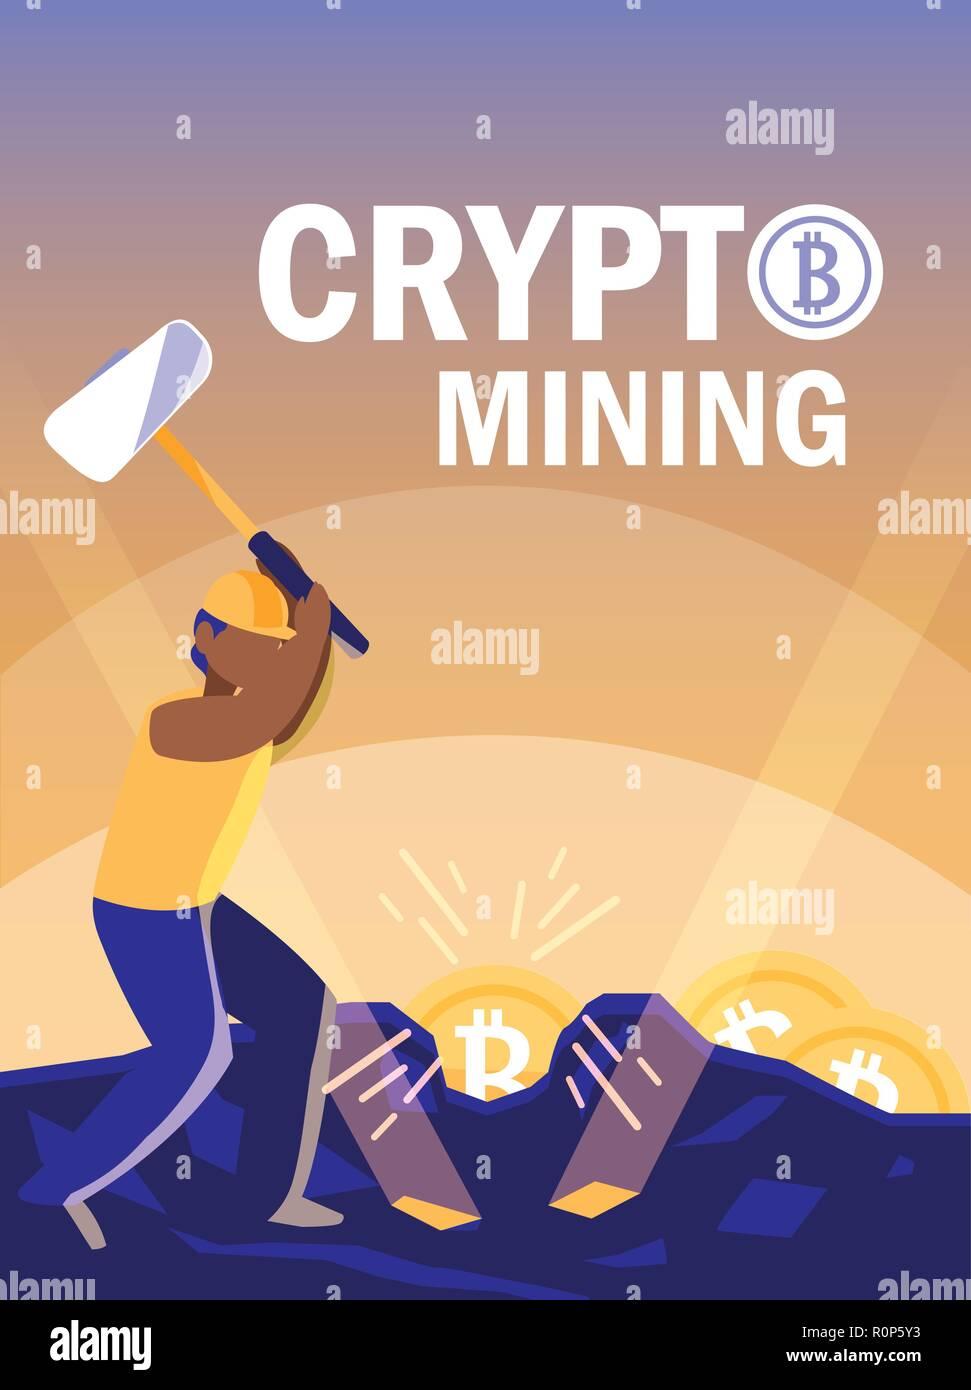 Bckp mining bitcoins asal usul betting beras basah langkawi